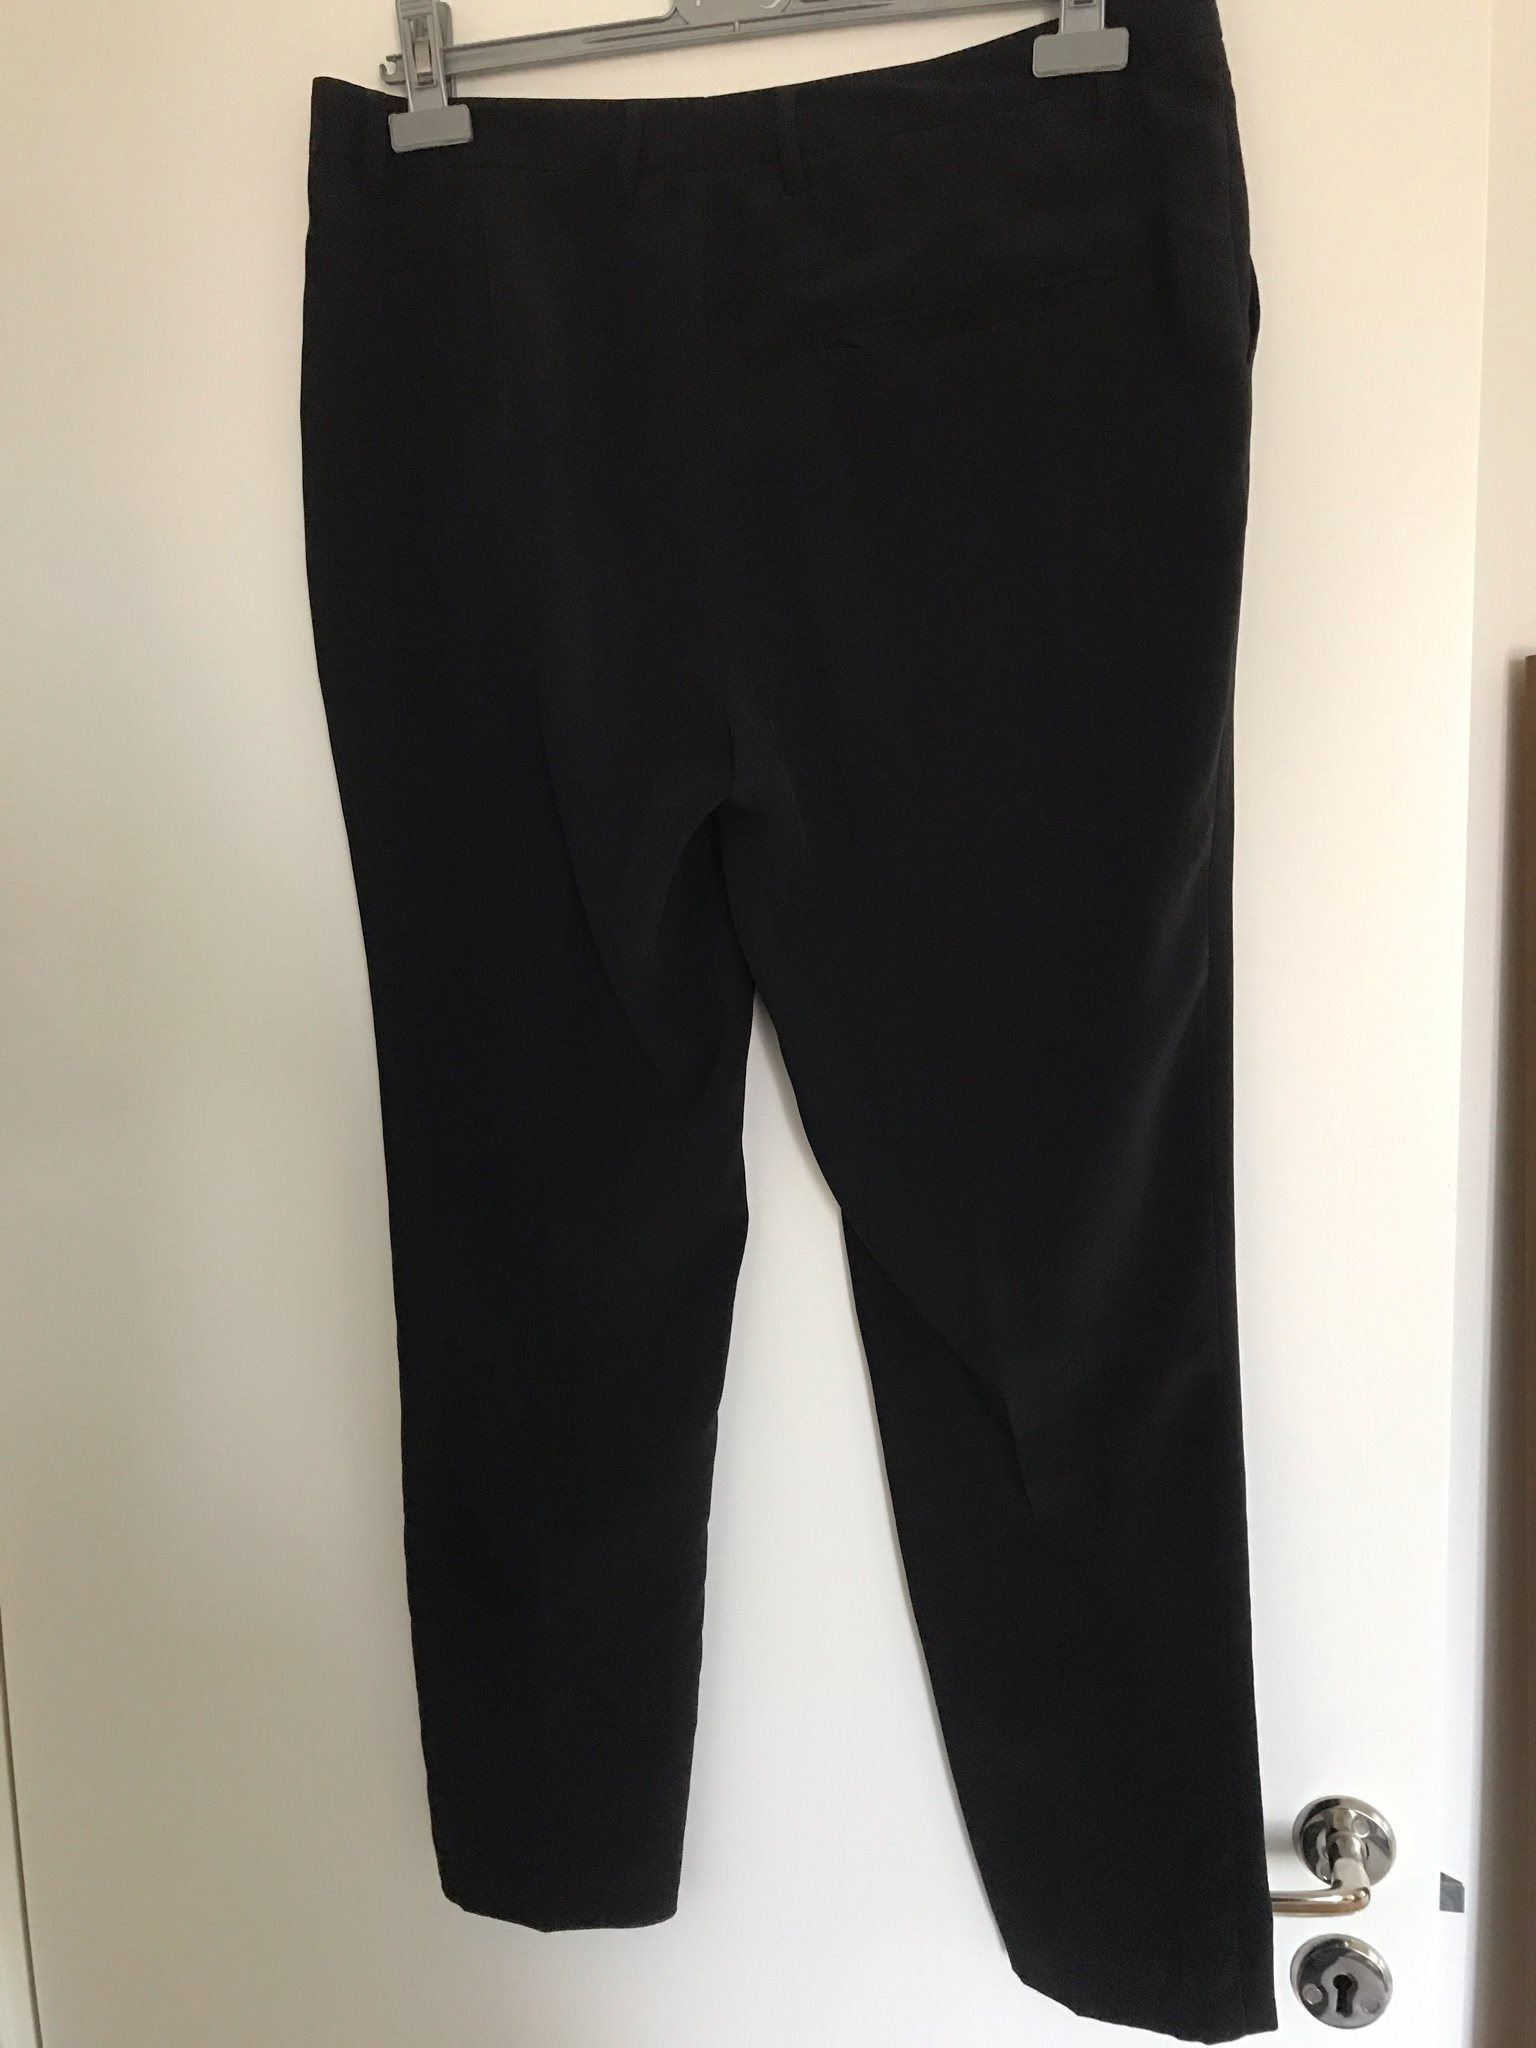 Filippa K kostym/fin byxor byxor byxor svart XL ed82d3